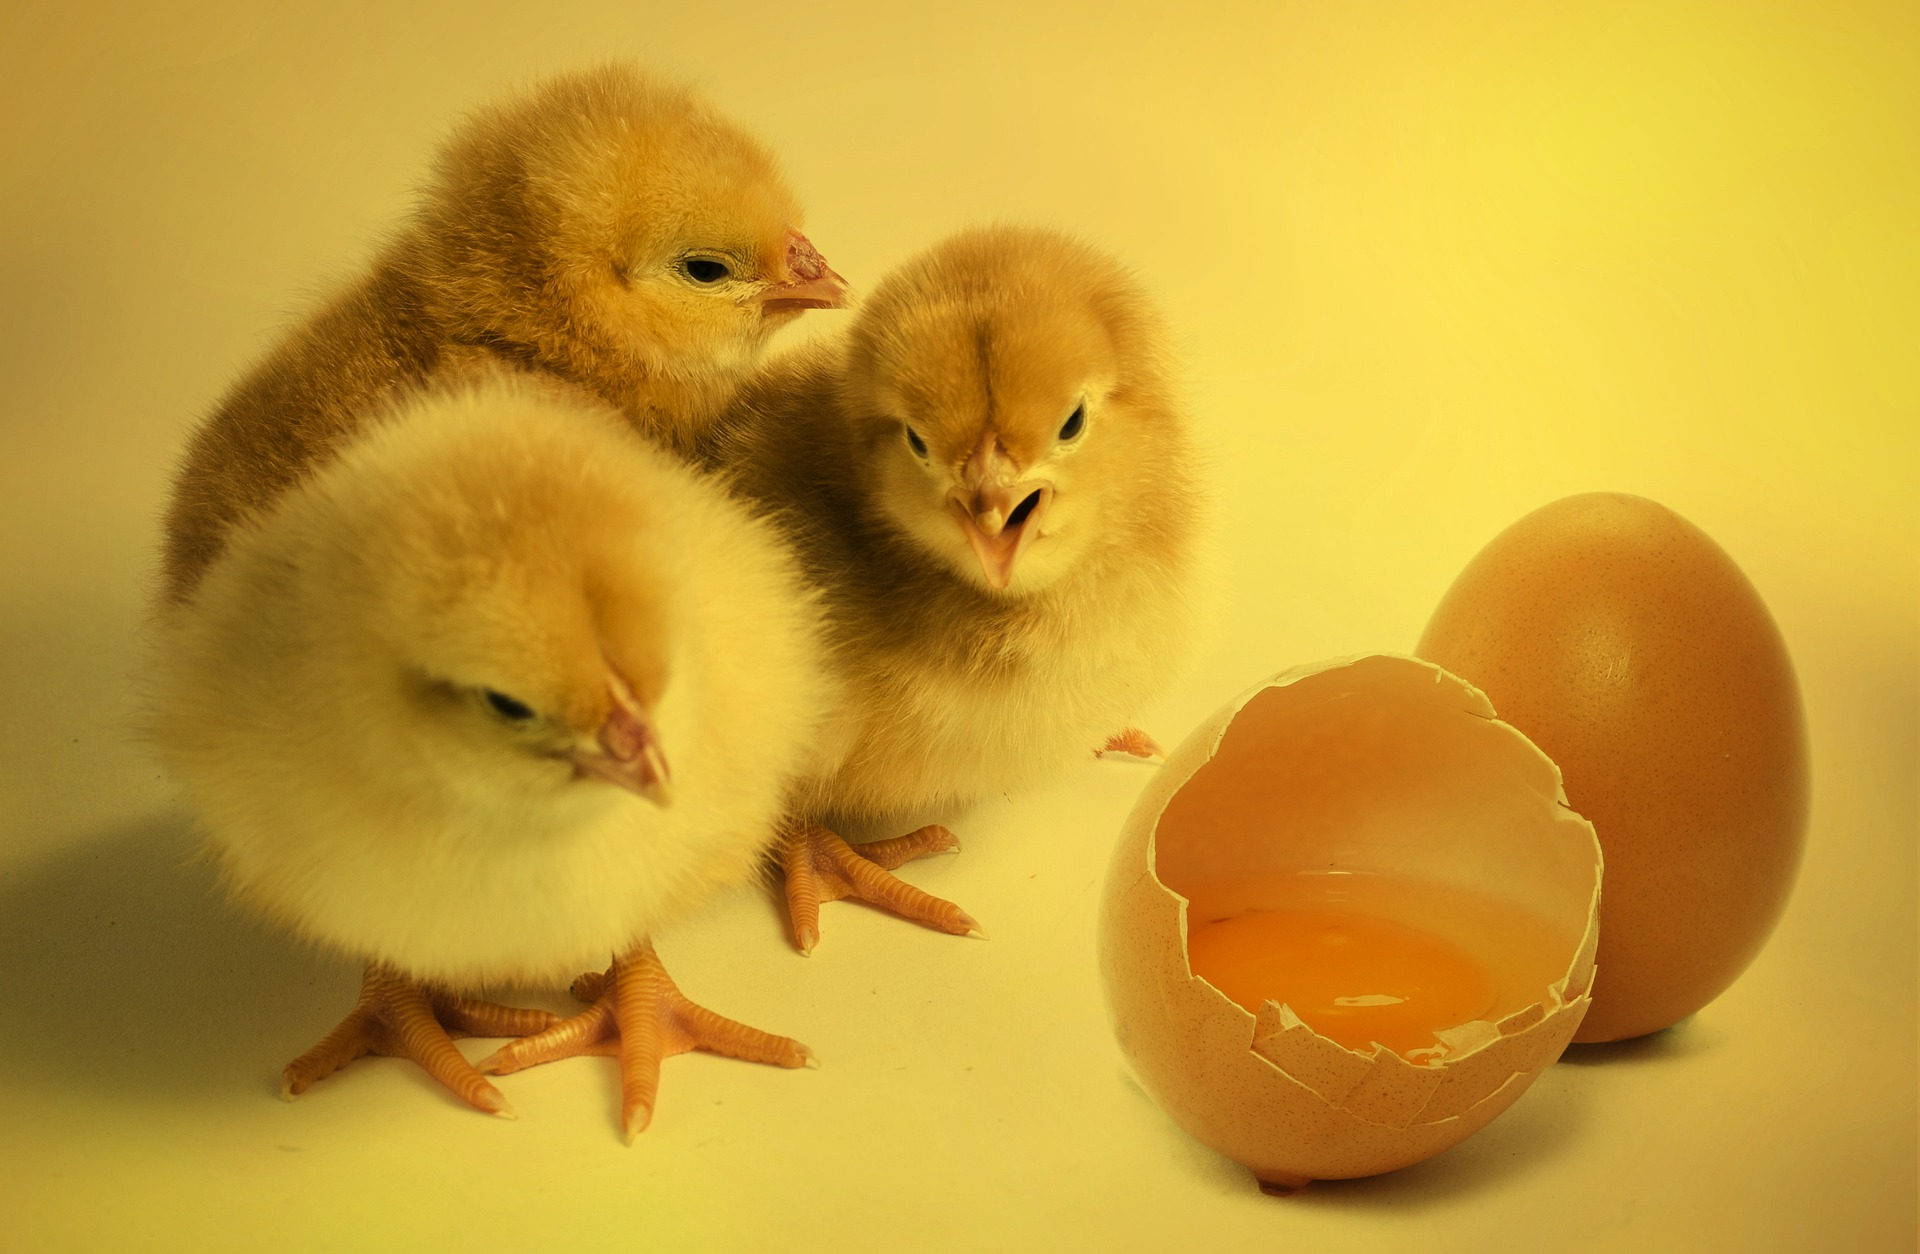 chicks-2965846_1920